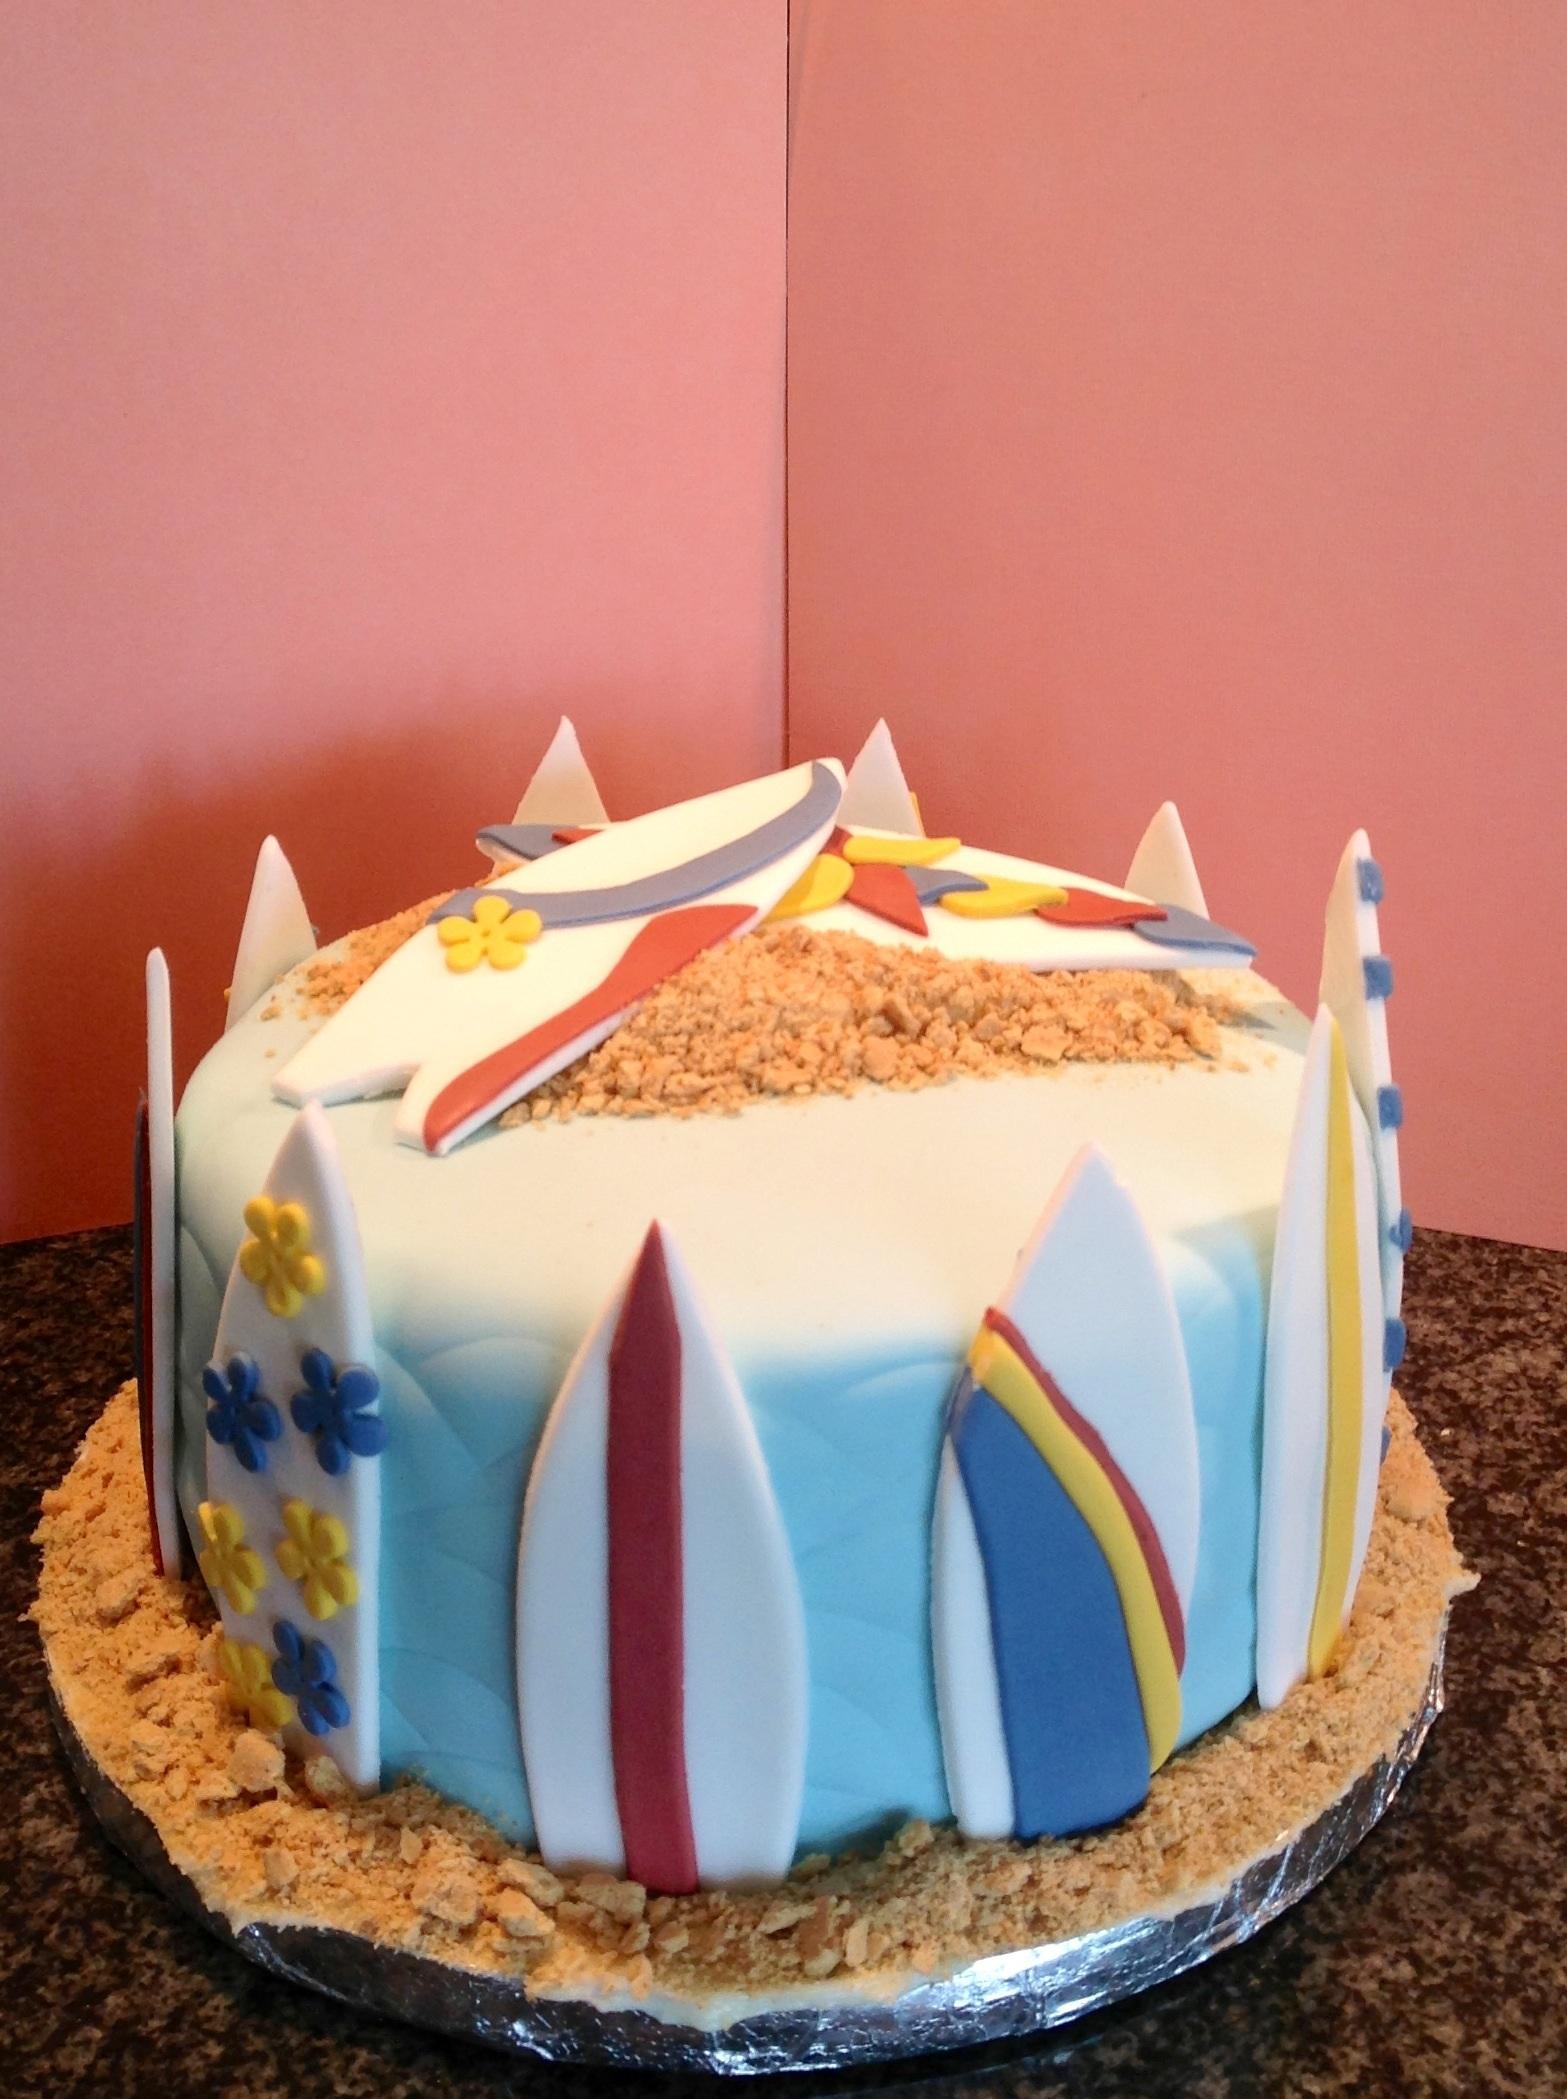 Cake Decorating Making Sand : Surfboard Cake - CakeCentral.com